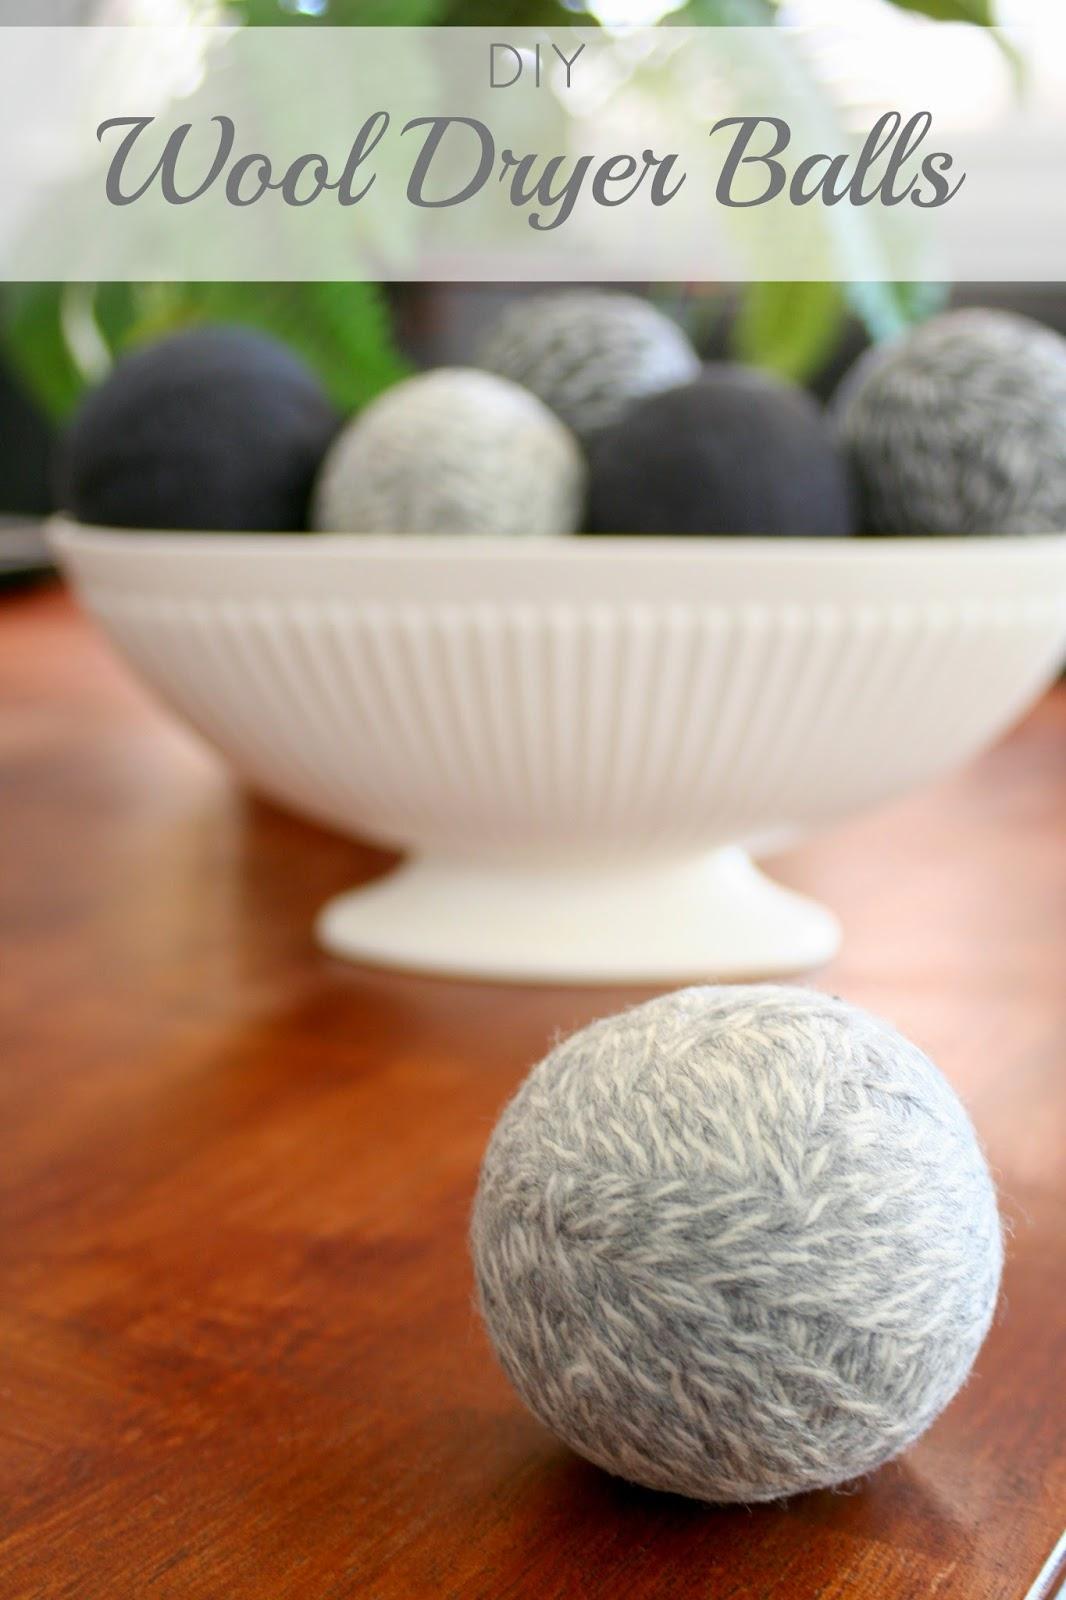 DIY Wool Dryer Balls – Jordan's Easy Entertaining